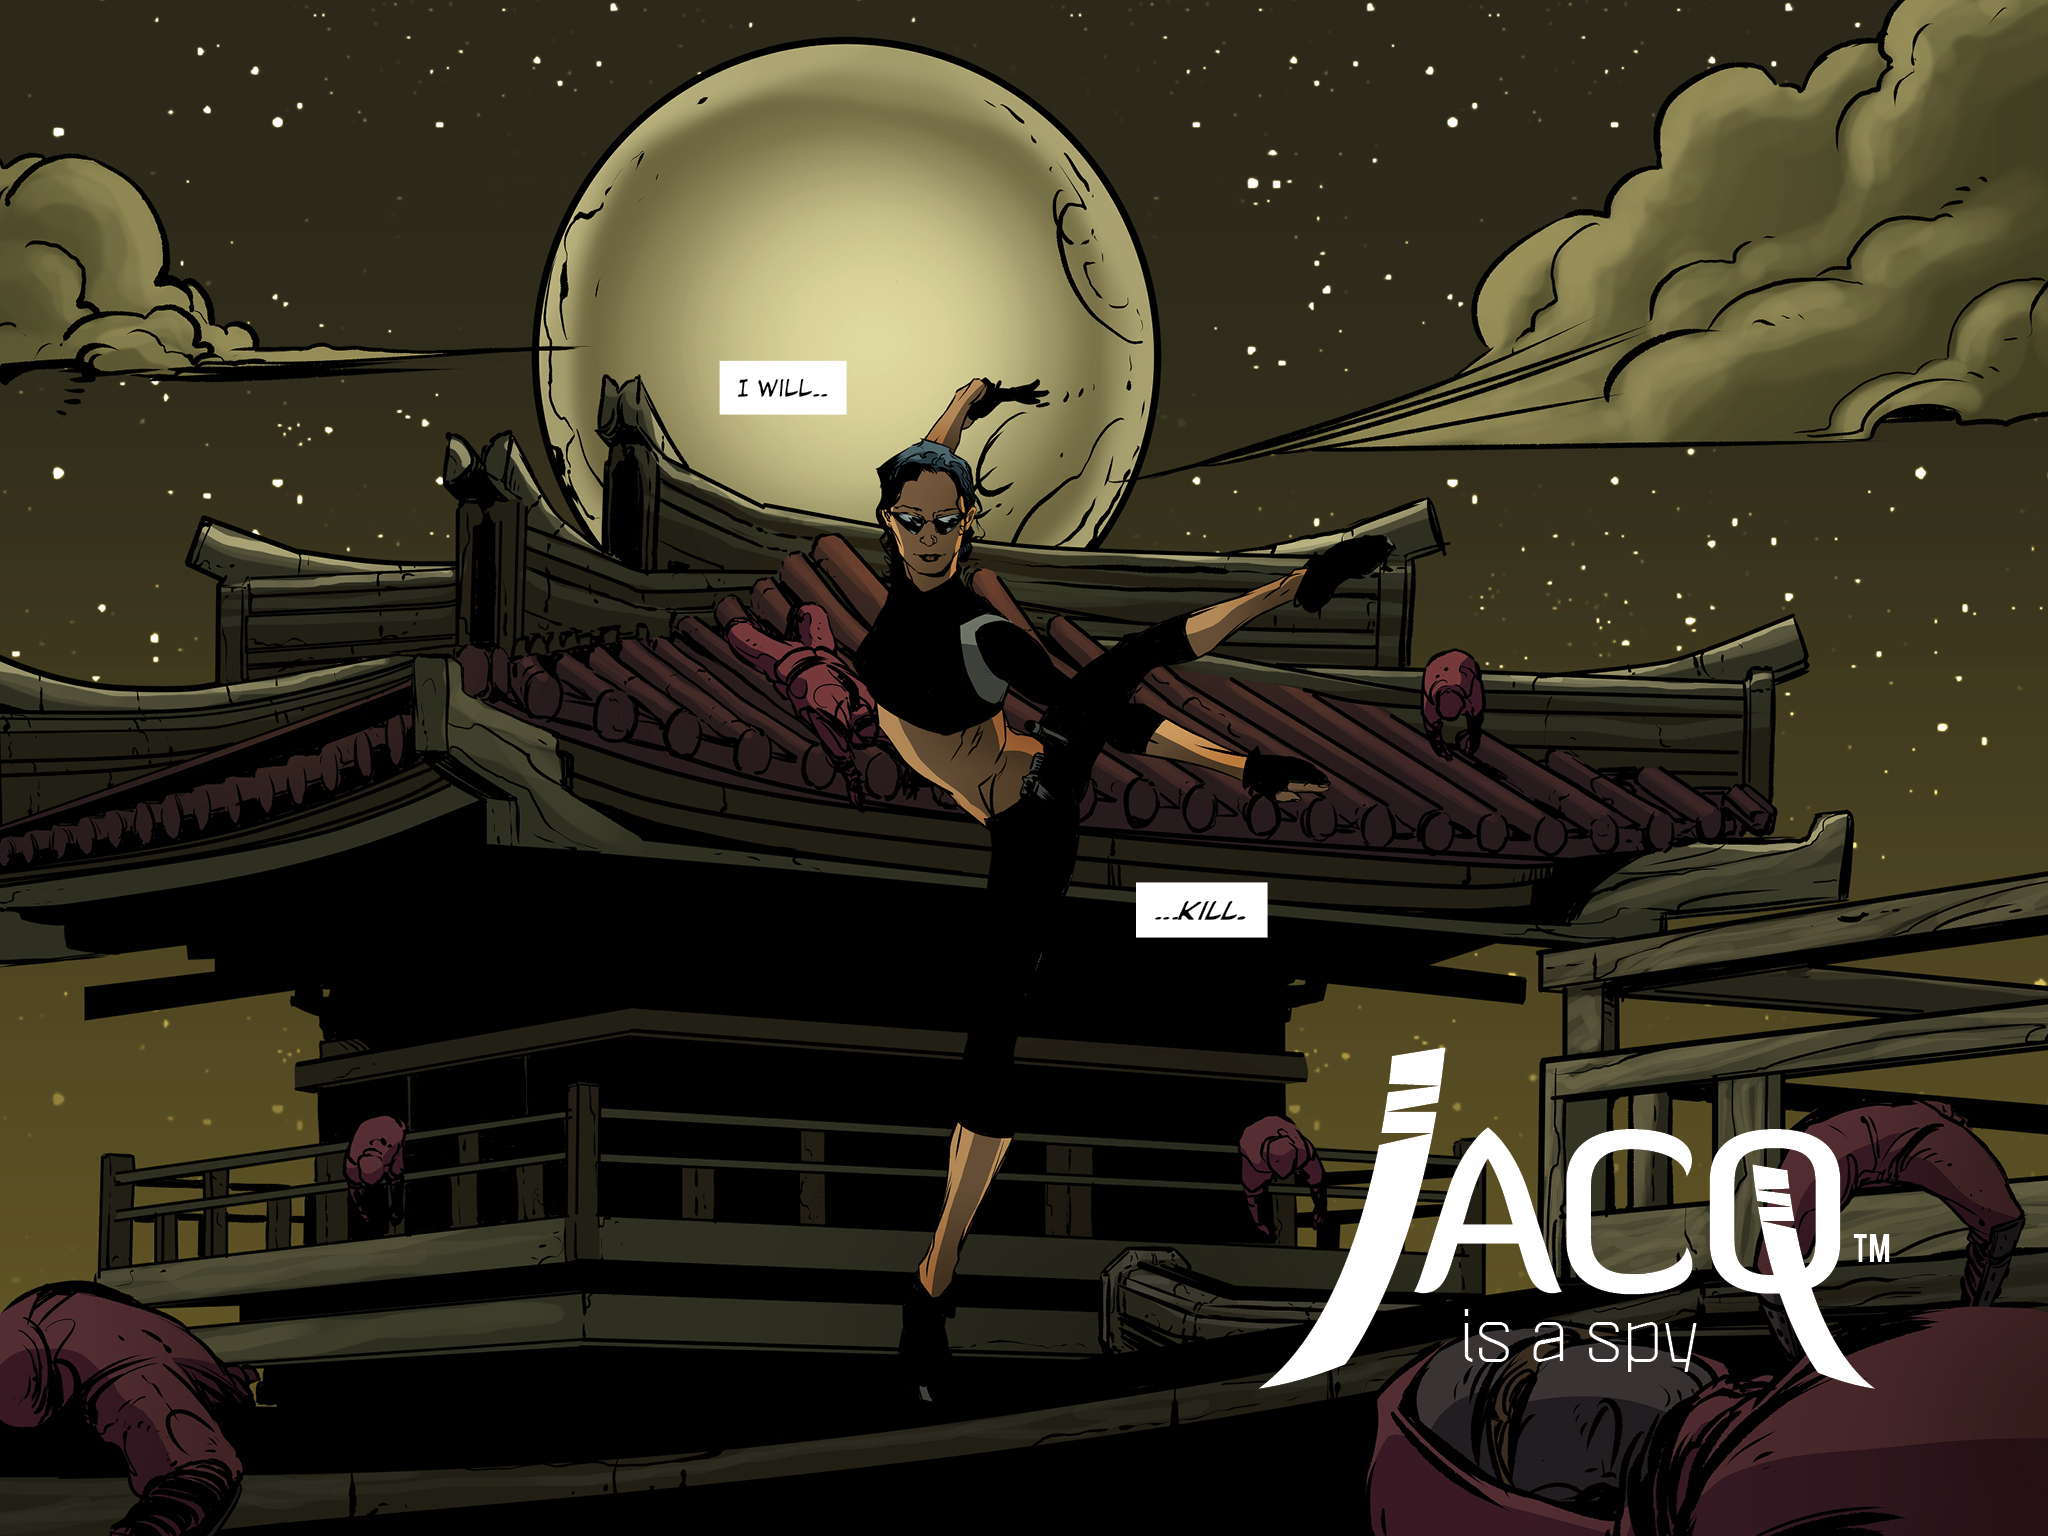 Jacq_Prologue15.jpg